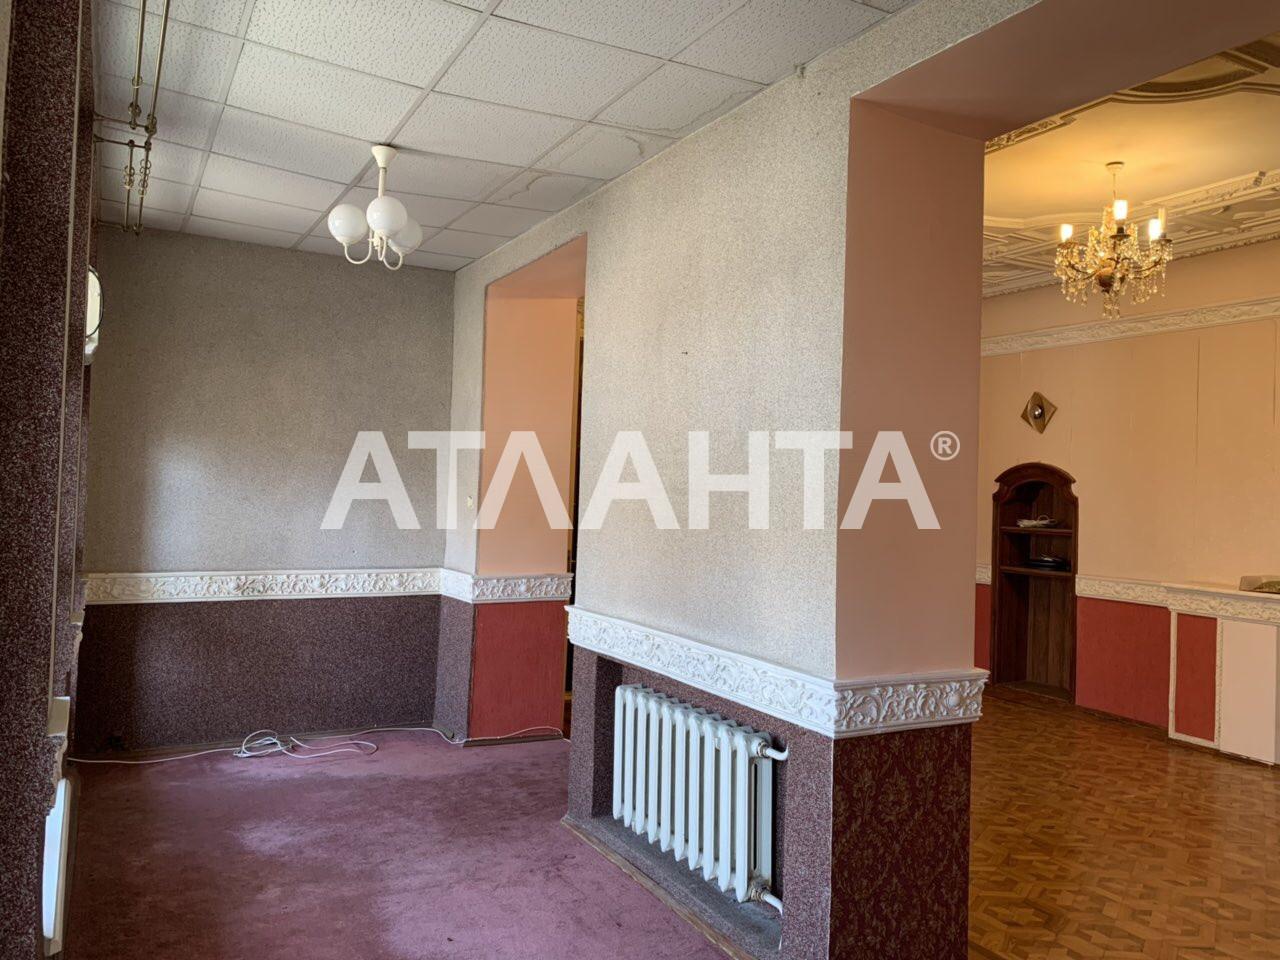 Продается 3-комнатная Квартира на ул. Французский Бул. (Пролетарский Бул.) — 85 000 у.е. (фото №2)